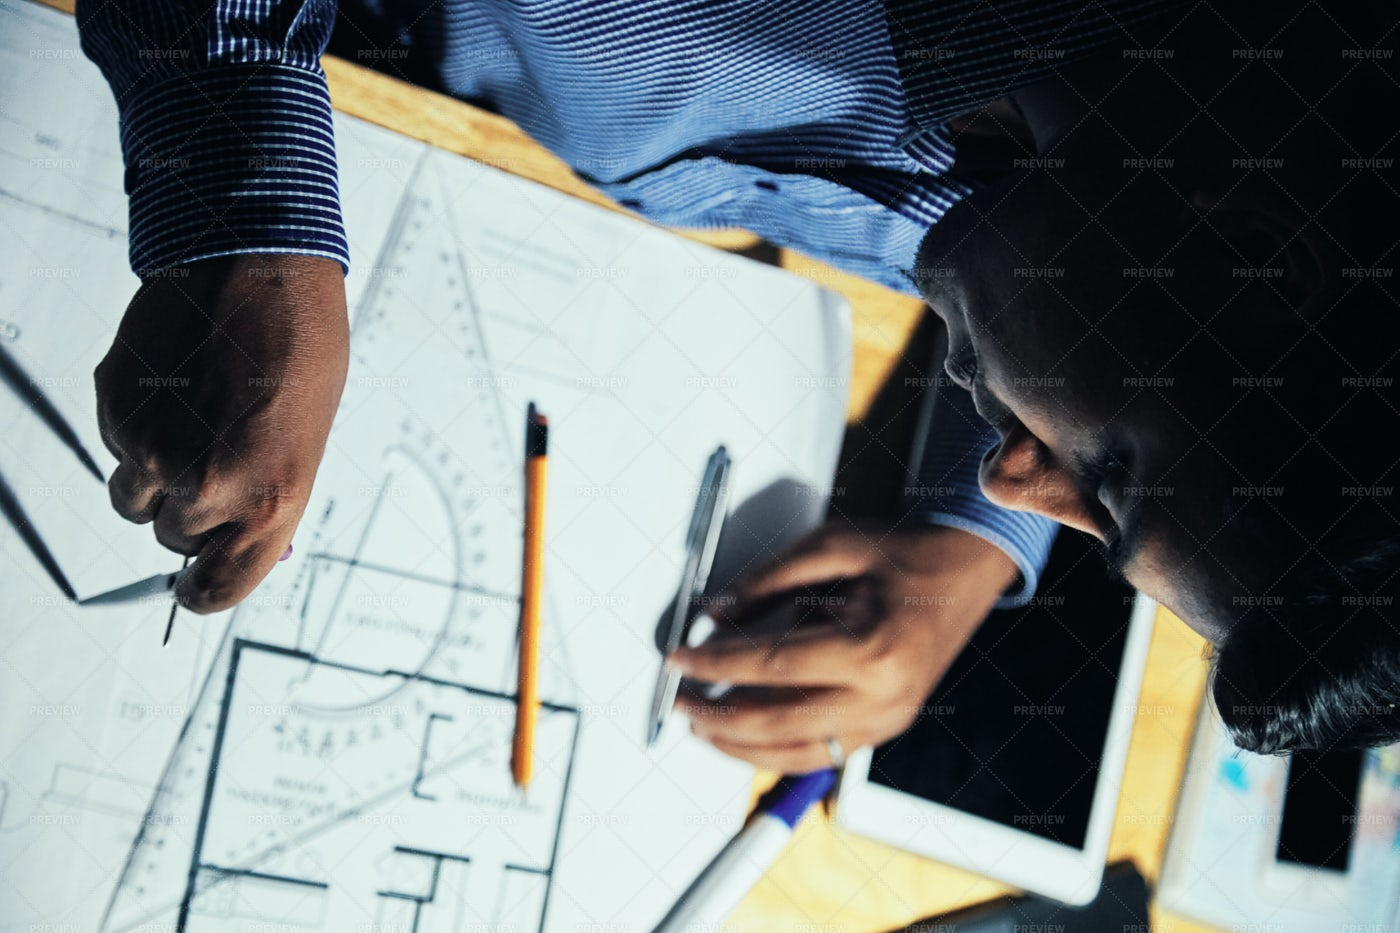 Man Working On Blueprint In Evening: Stock Photos